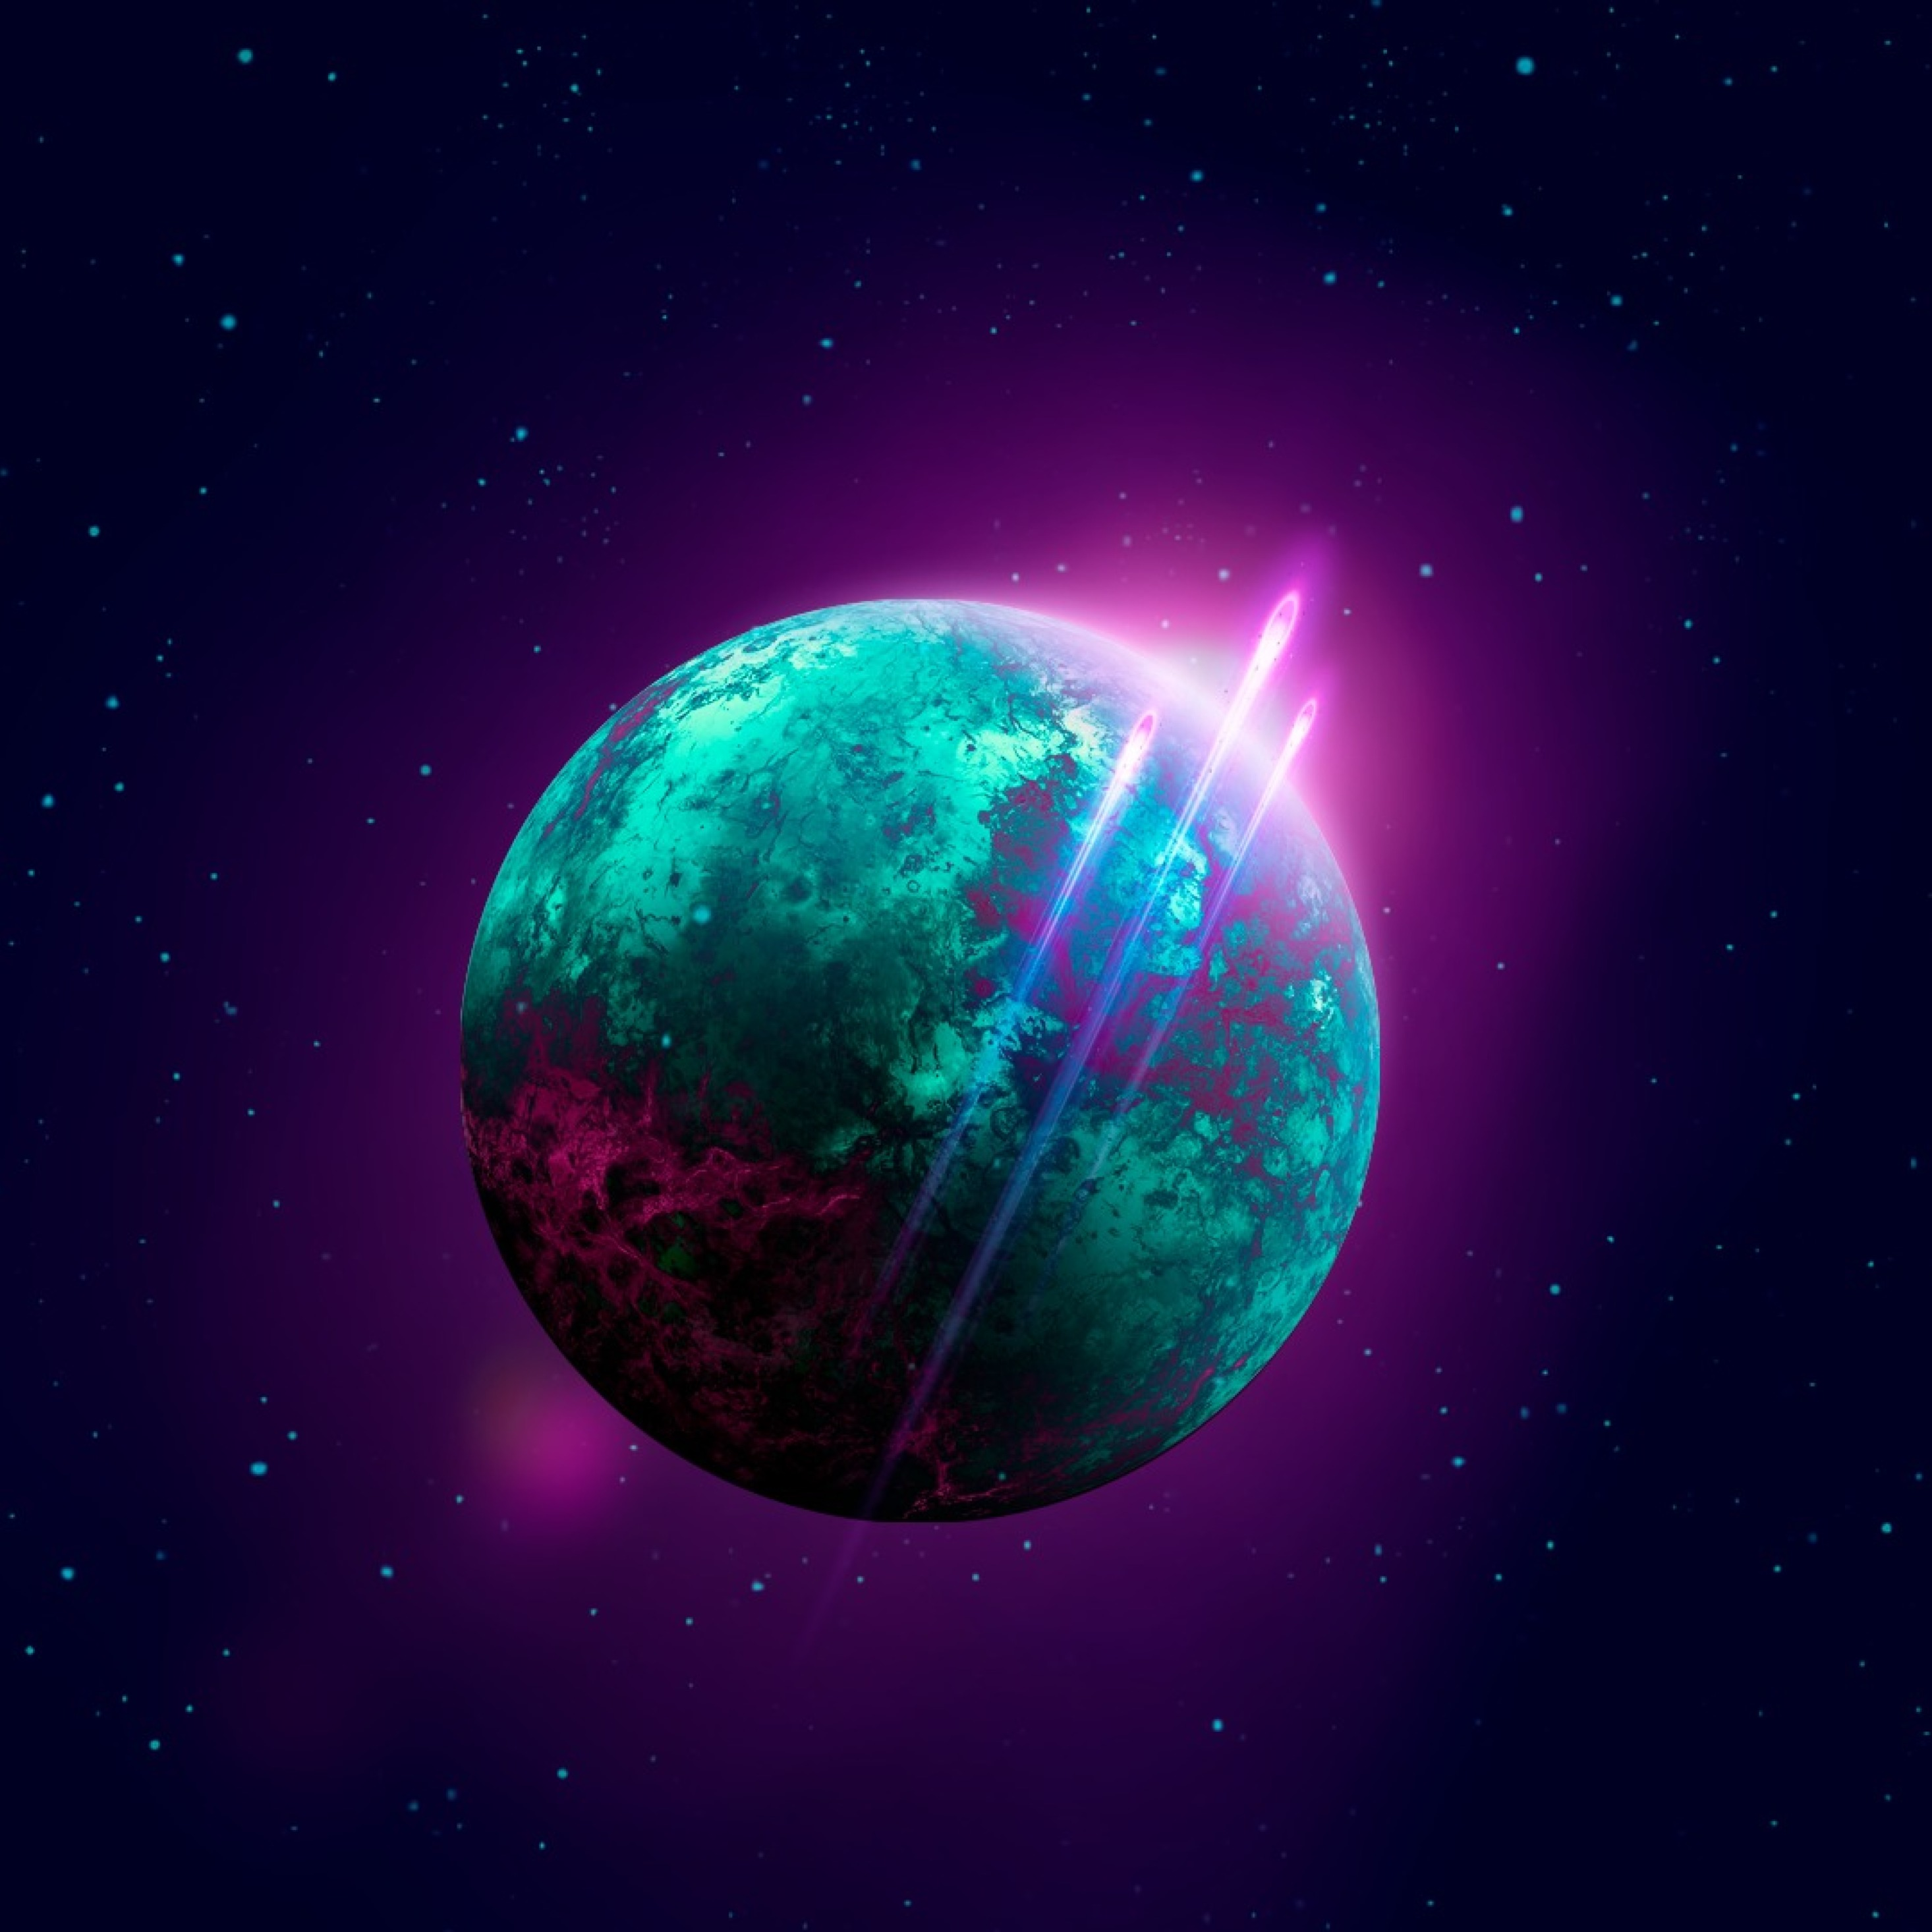 Space Retro-wave Planet, Full HD Wallpaper